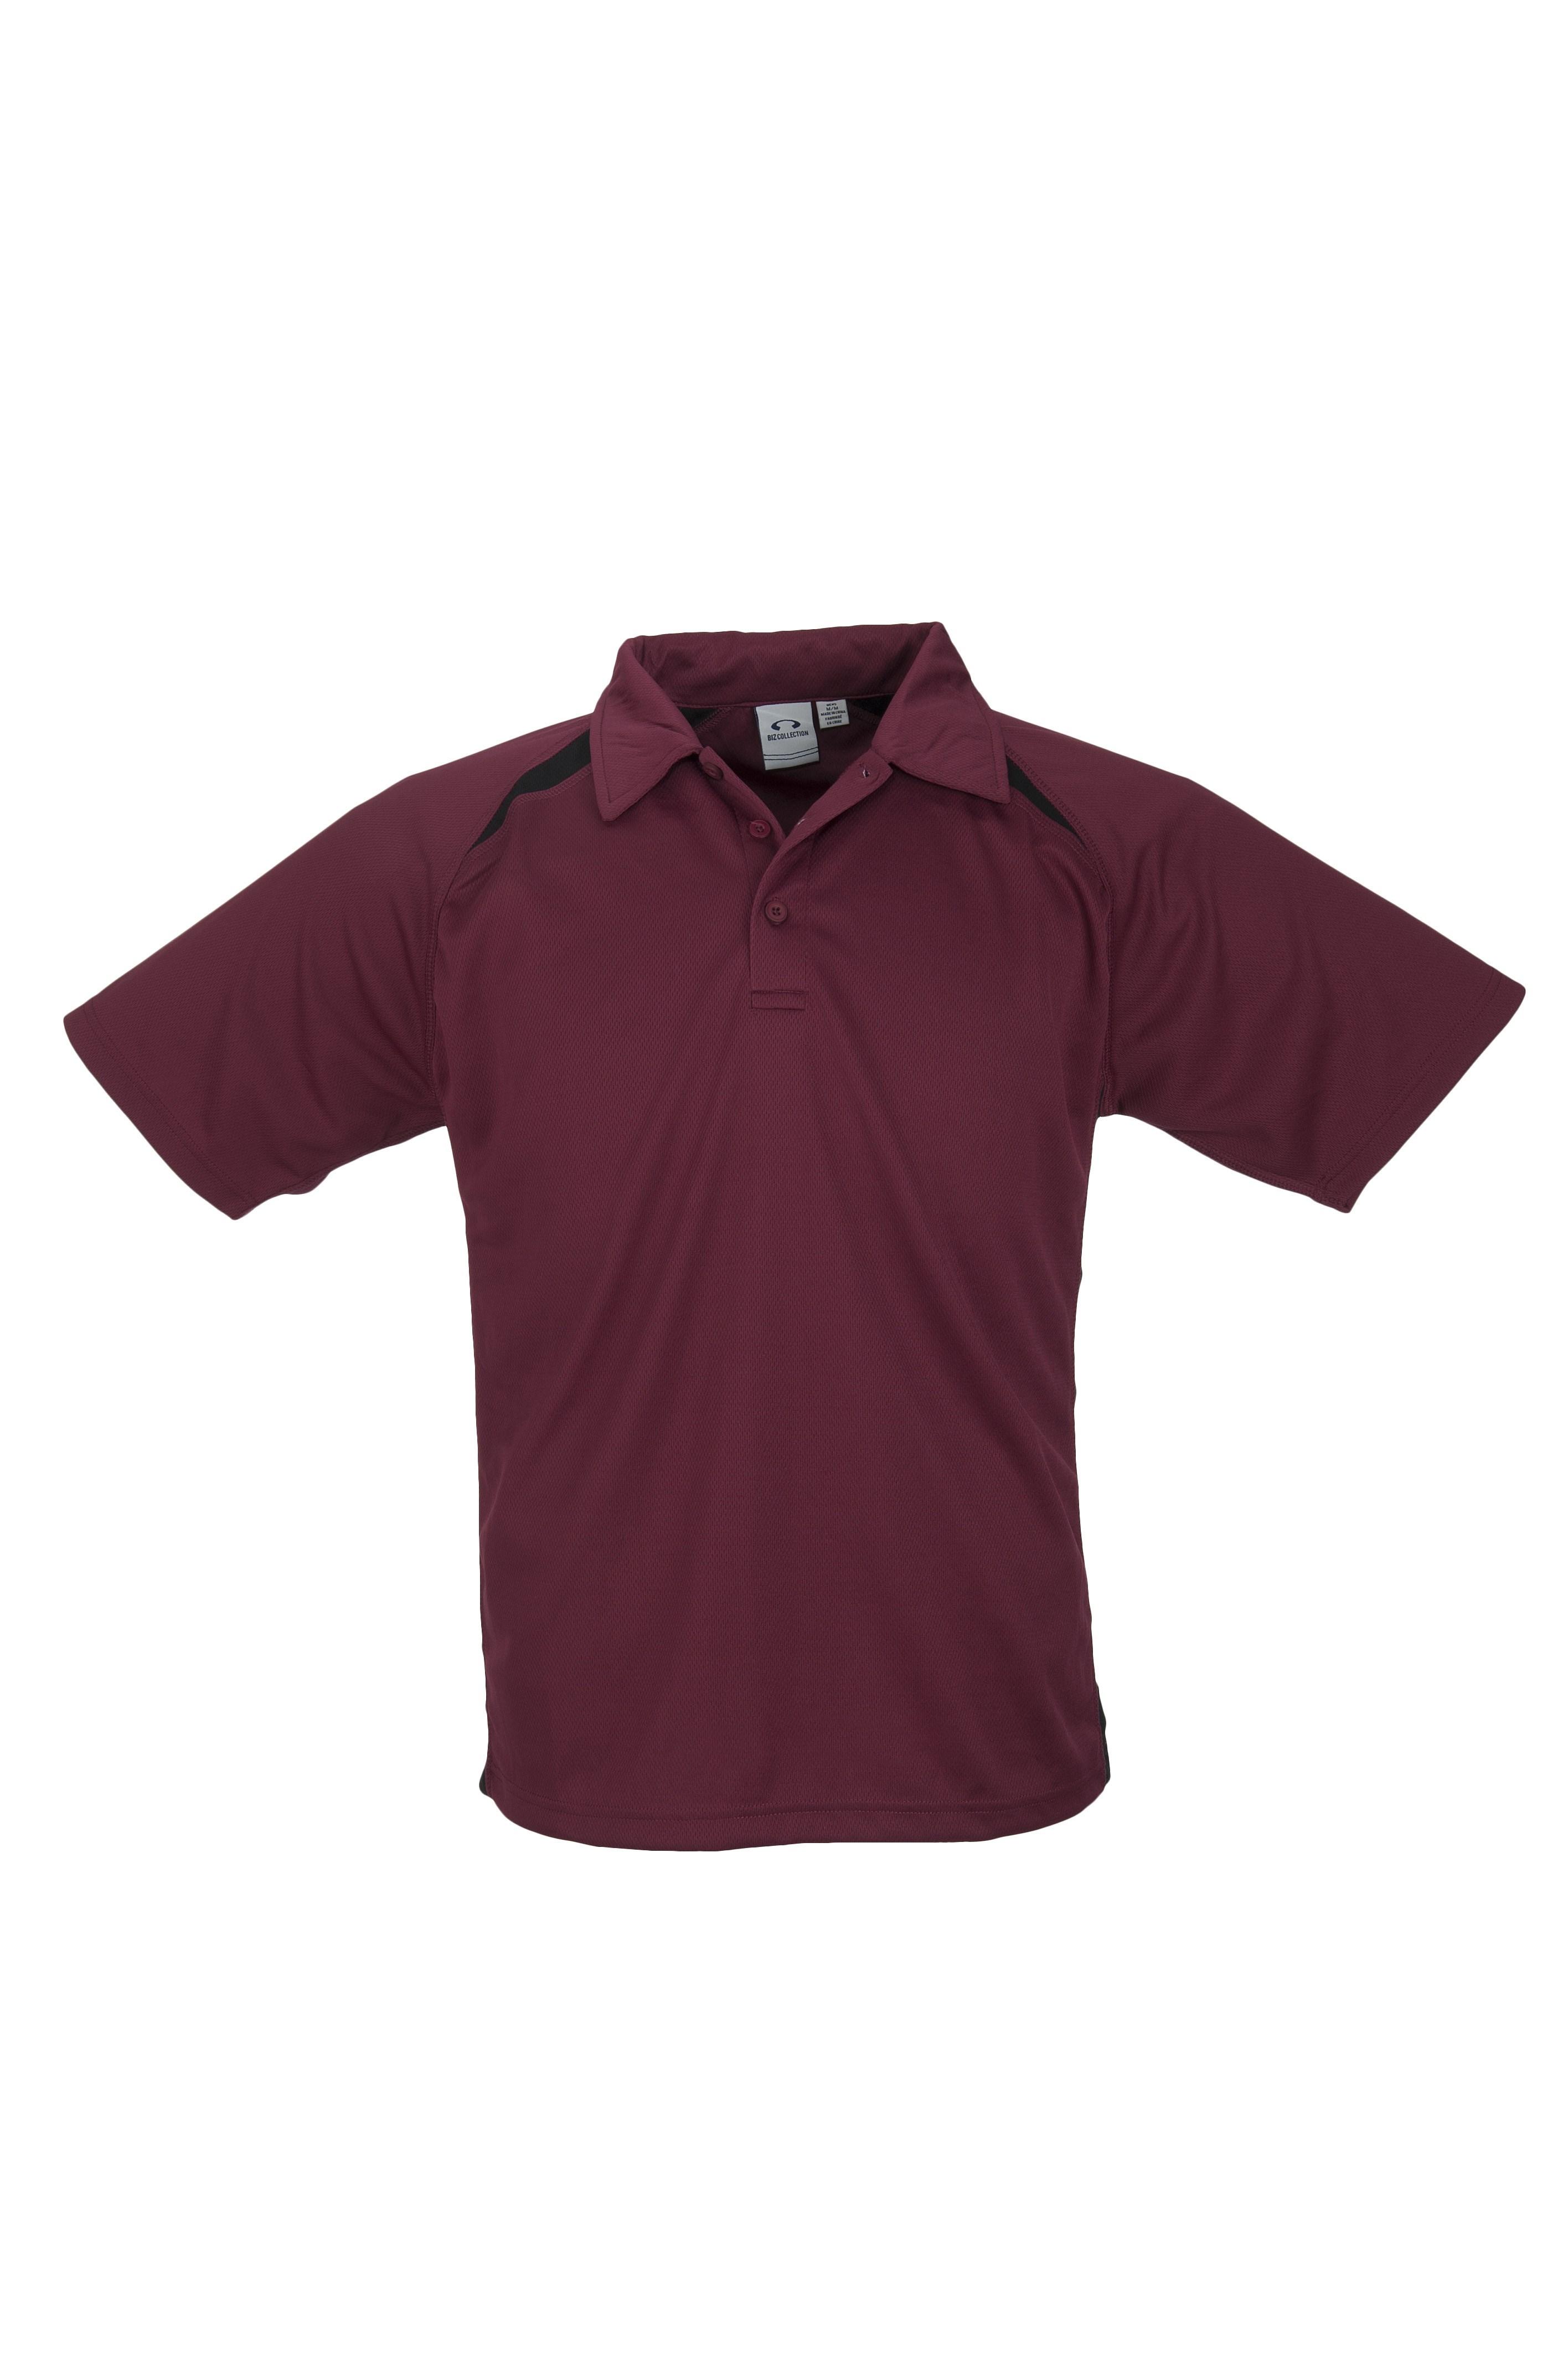 Splice mens golf shirt maroon only biz 3610 m for Name brand golf shirts direct